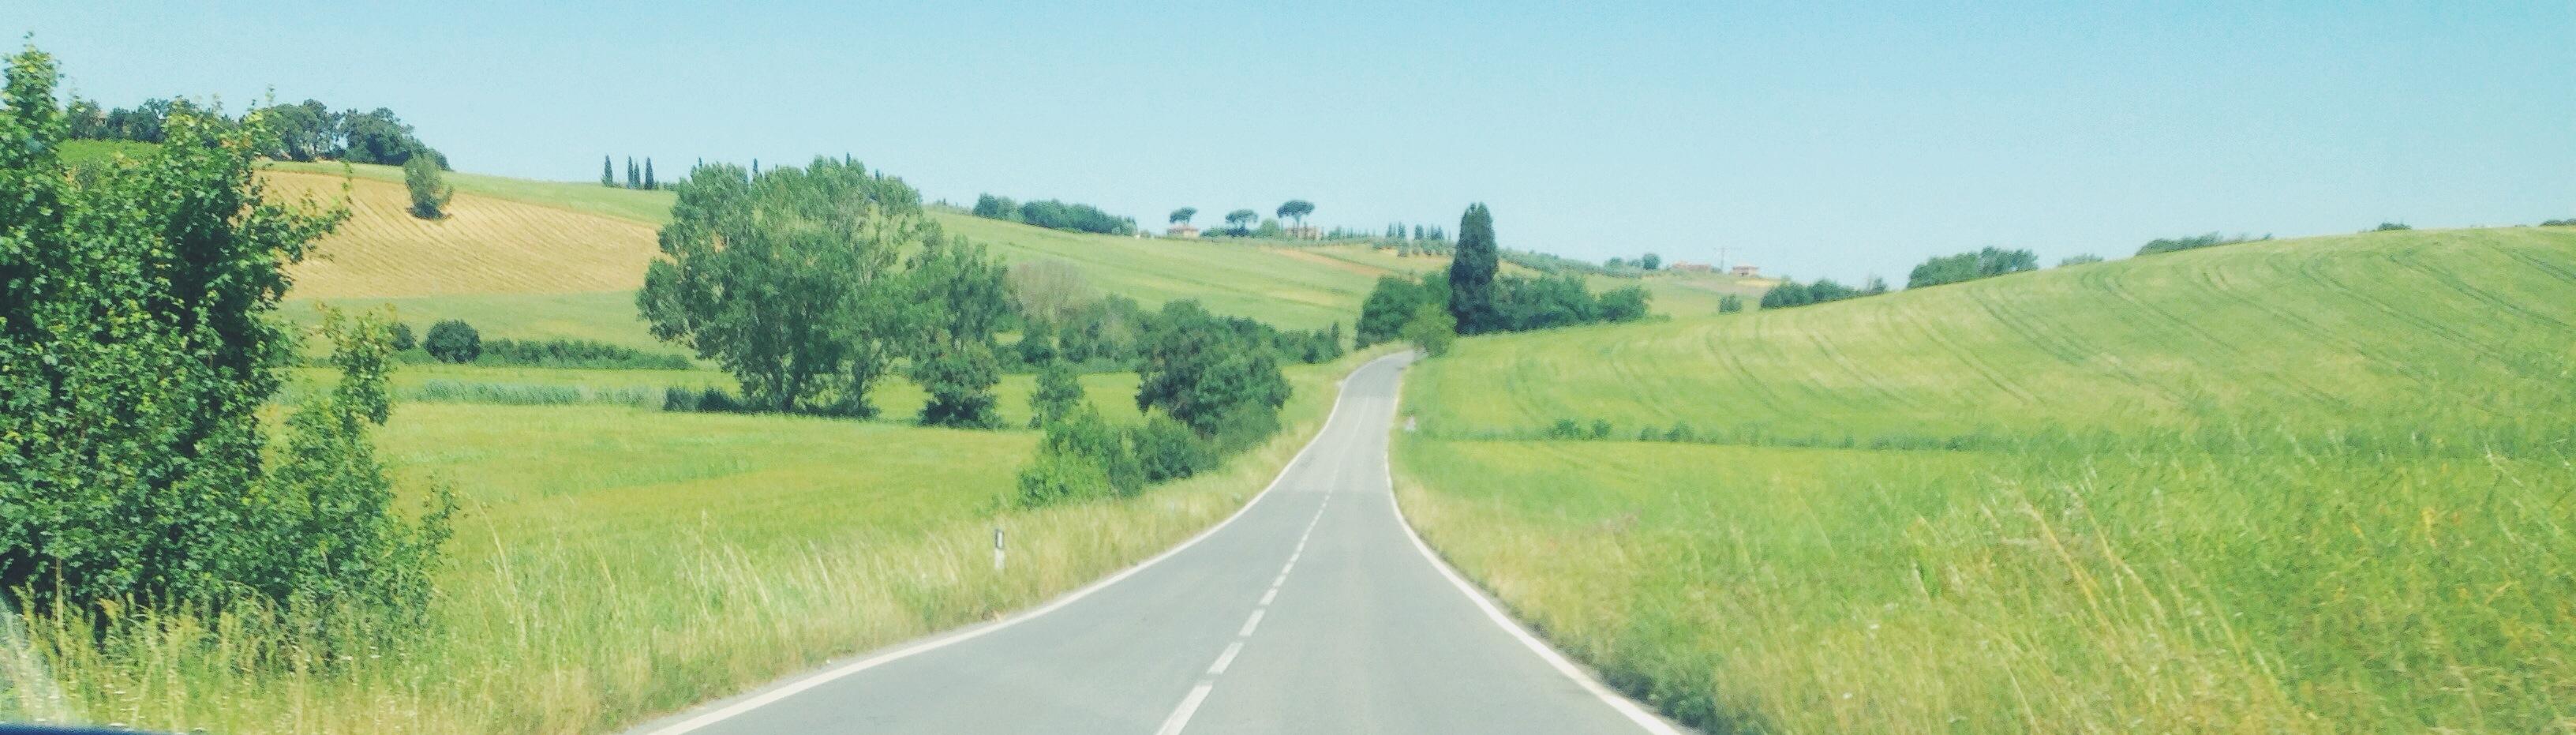 strada tra le colline toscane